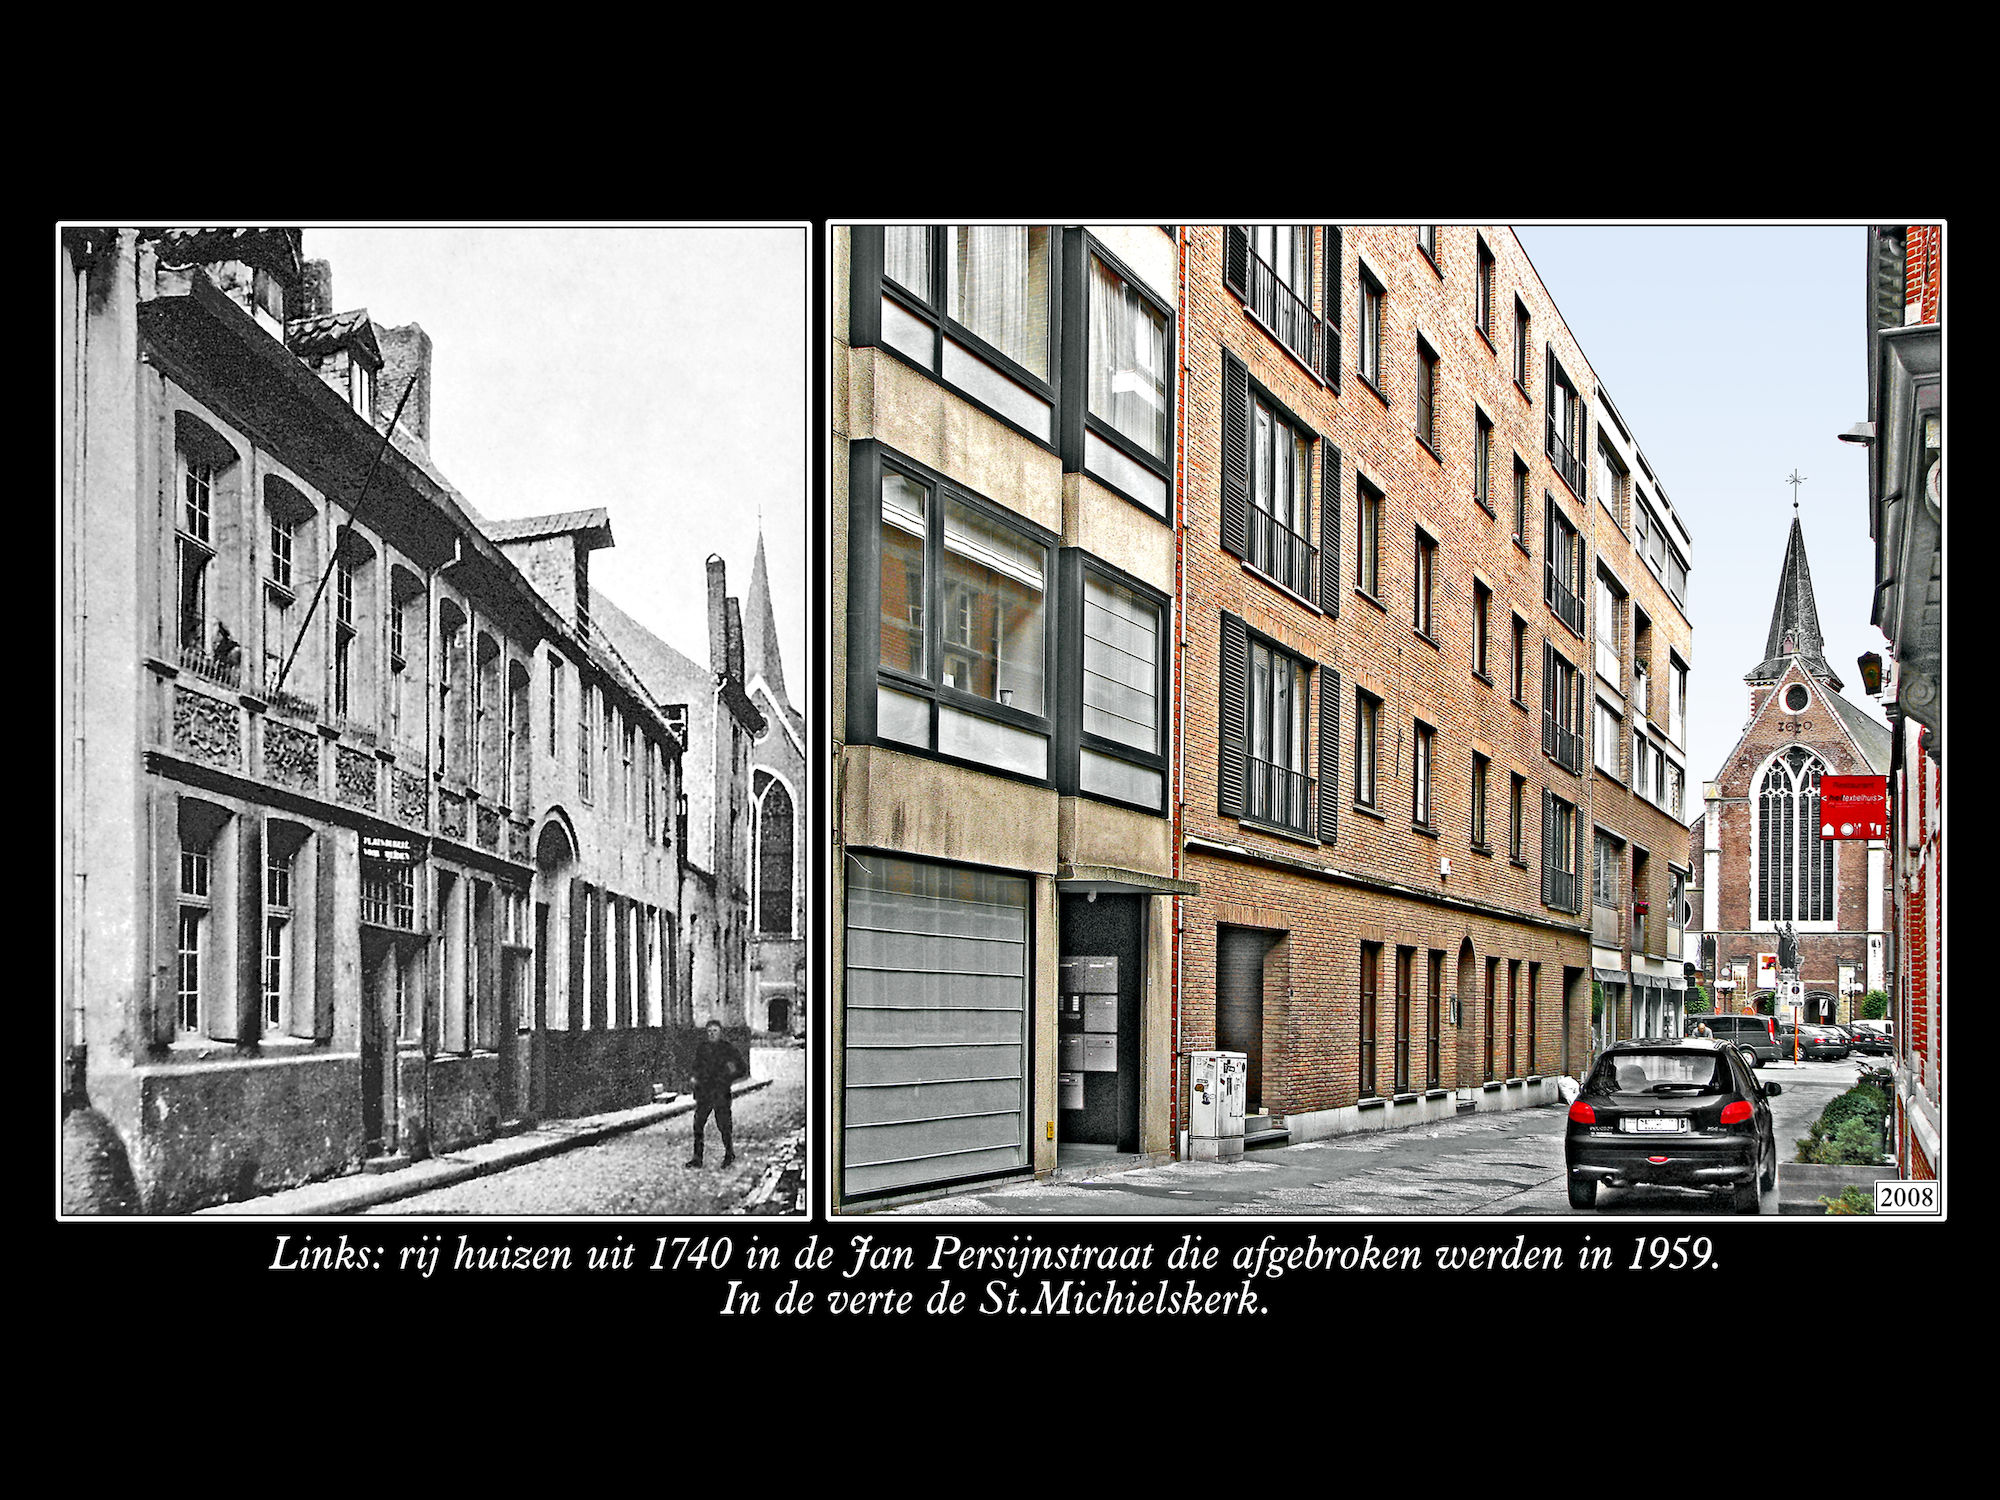 Jan Persijnstraat 1740